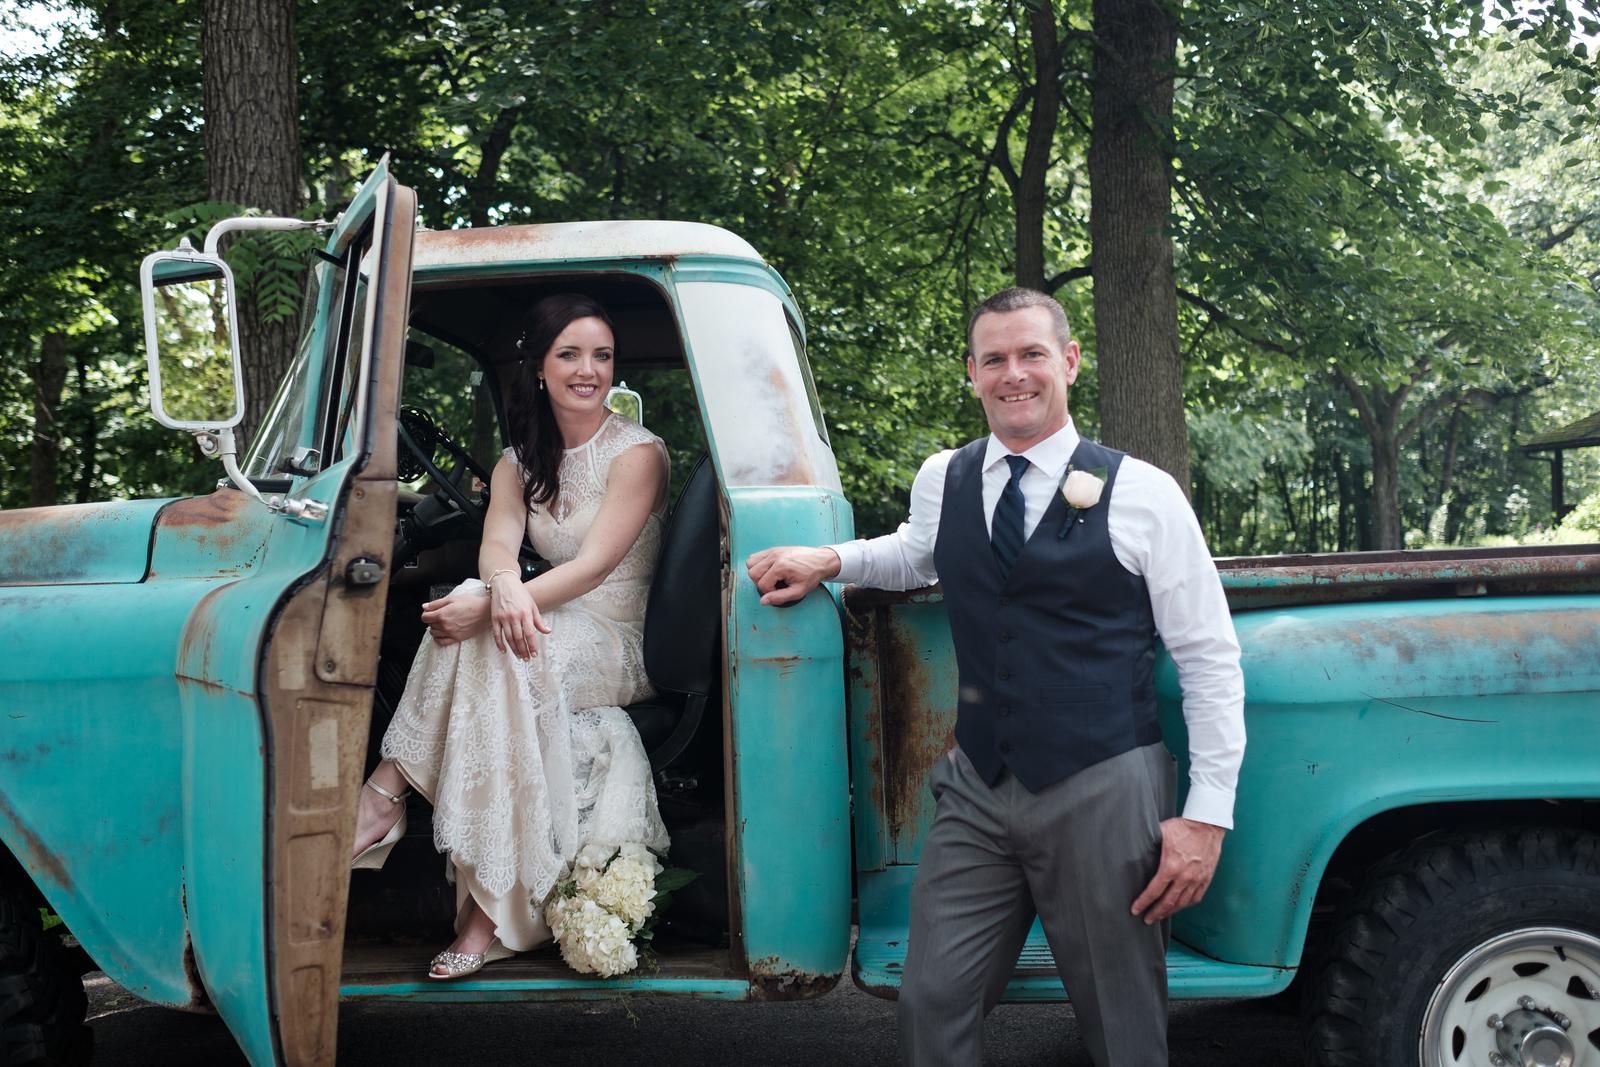 Jill & Rich's Kilbuck Creeek wedding